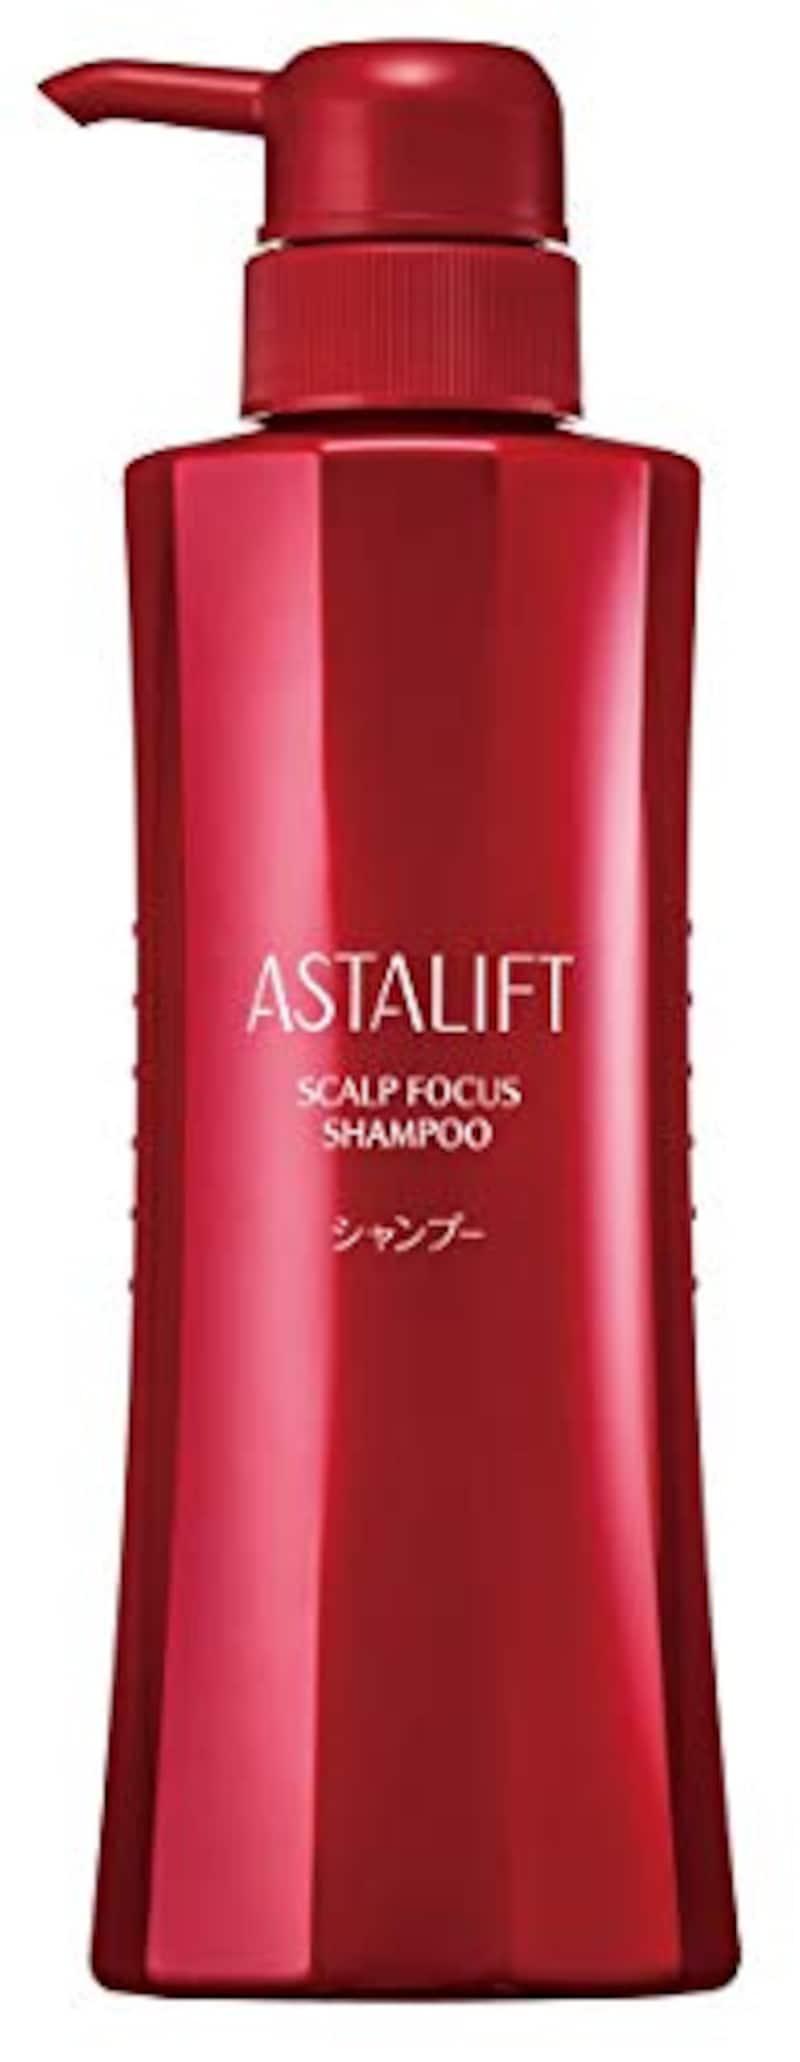 ASTALIFT(アスタリフト),スカルプフォーカスシャンプー